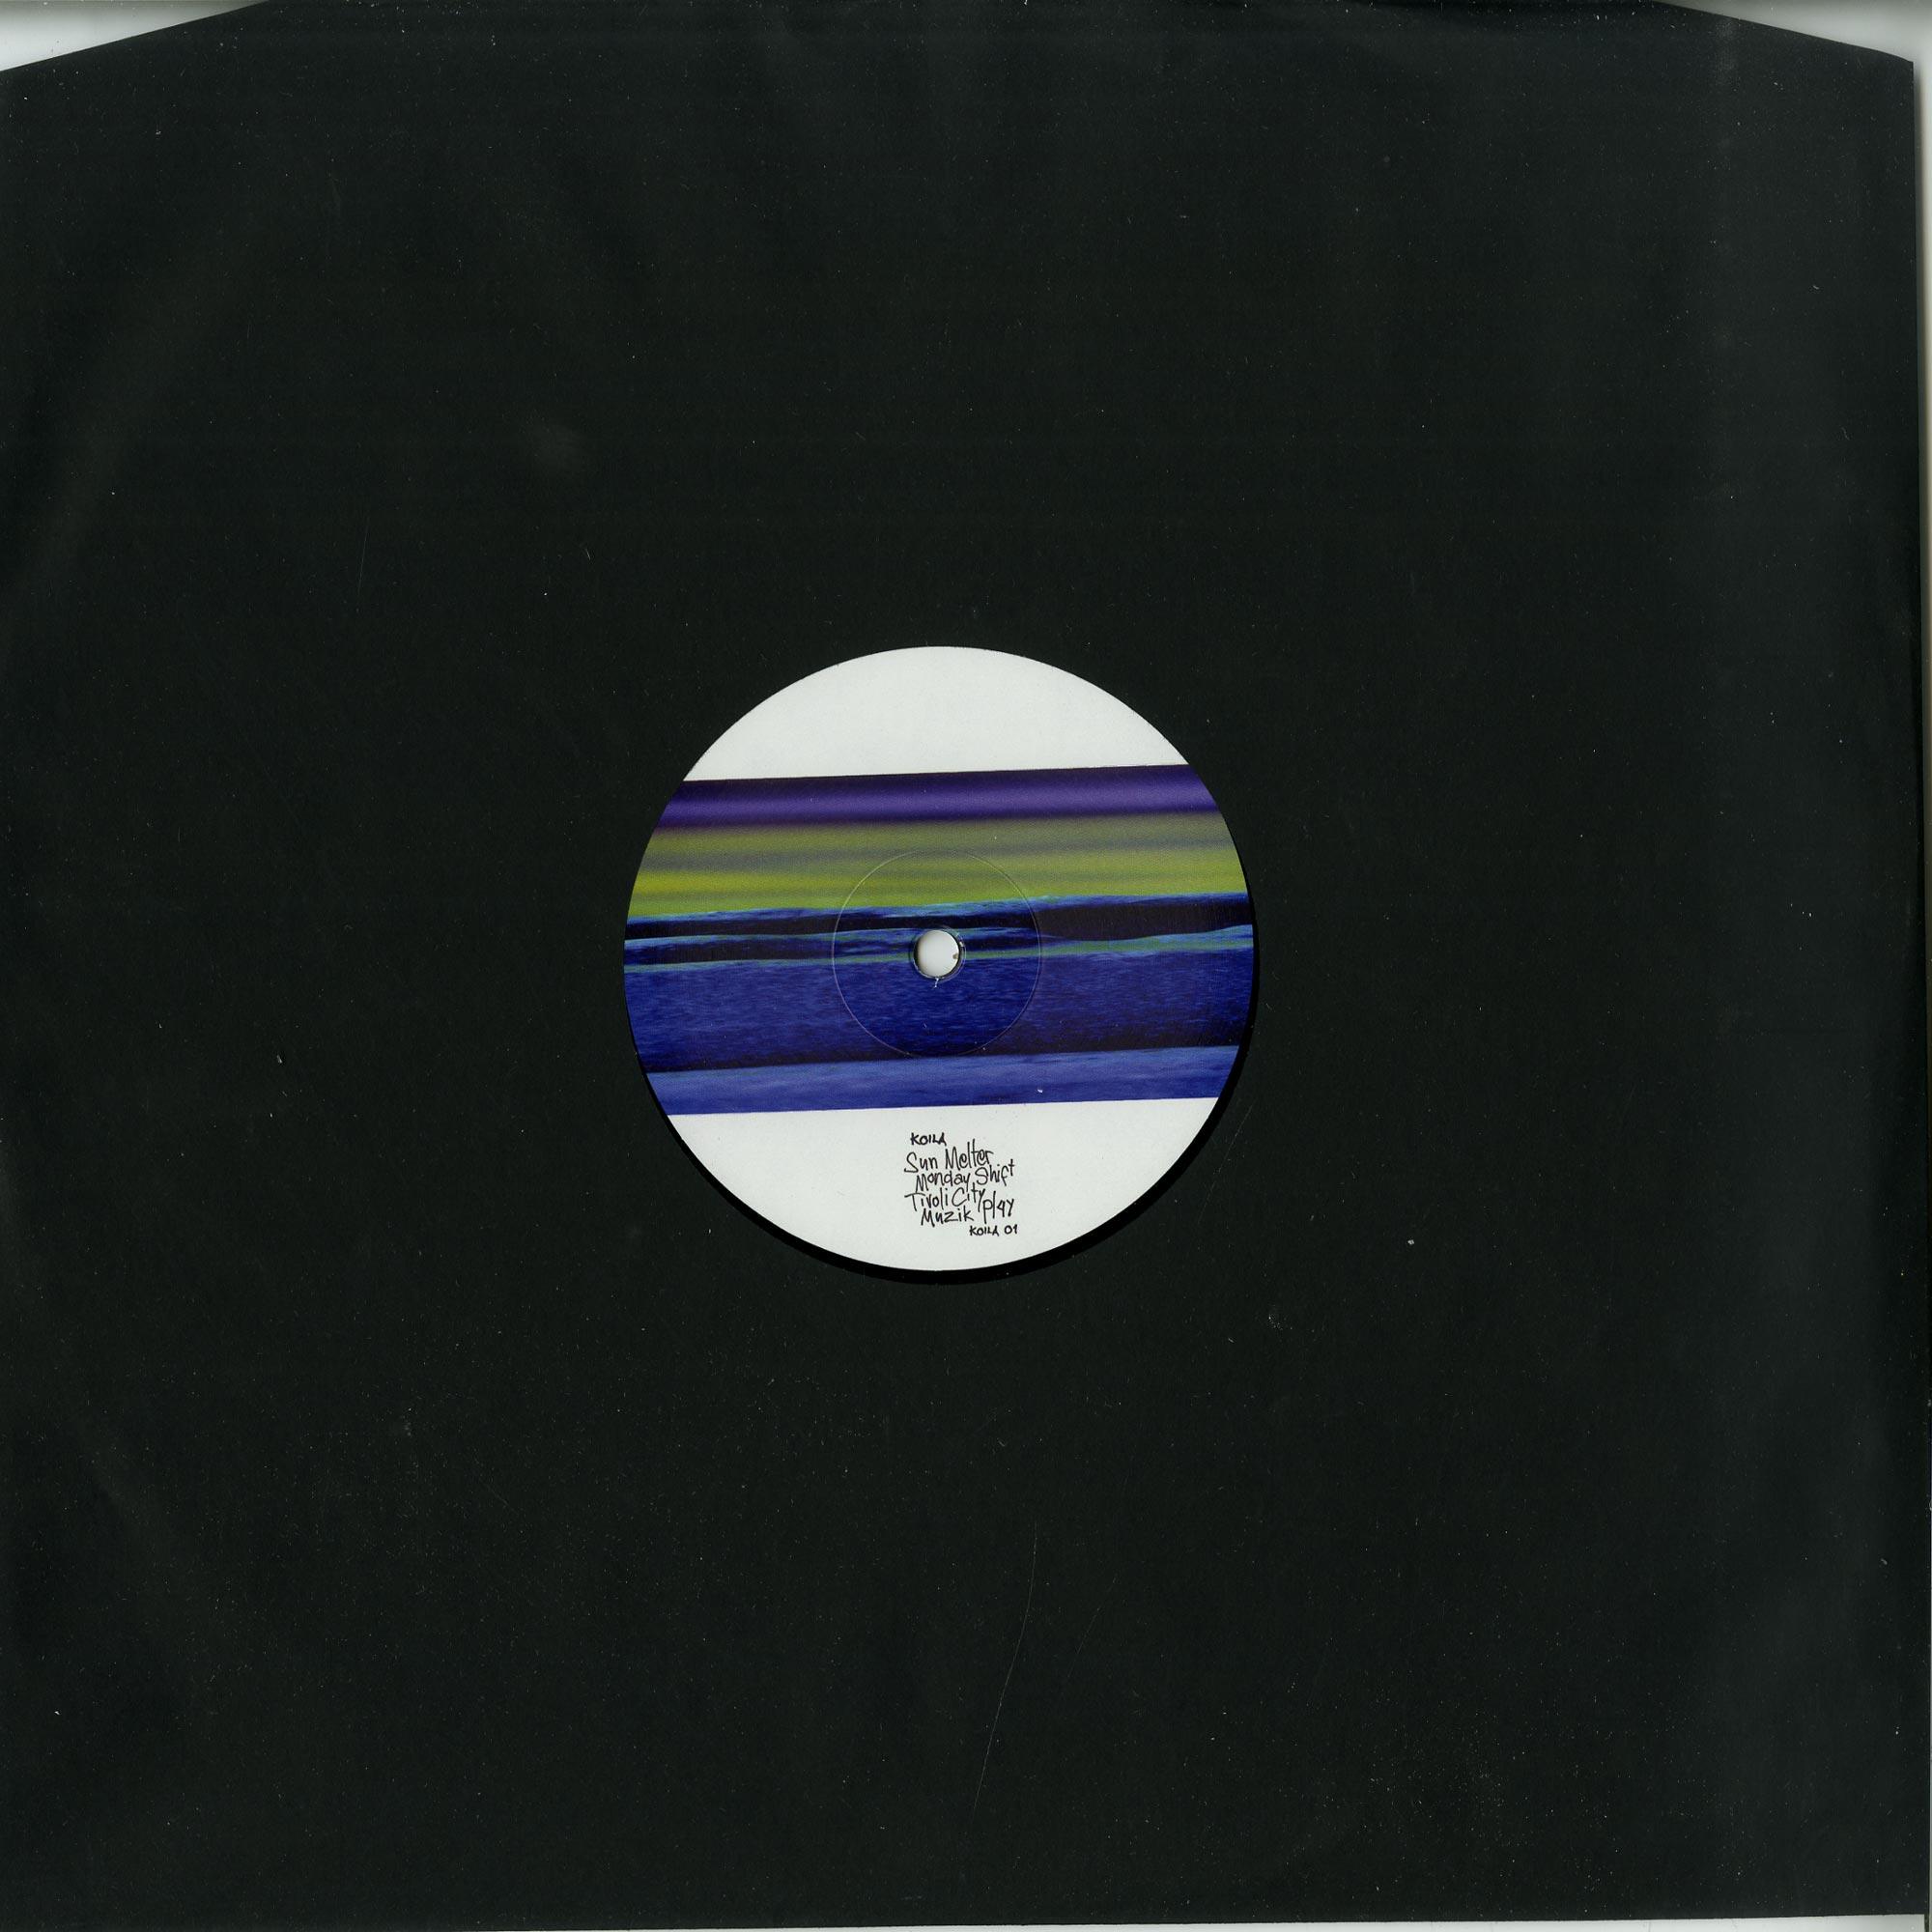 Koila - KOILA01